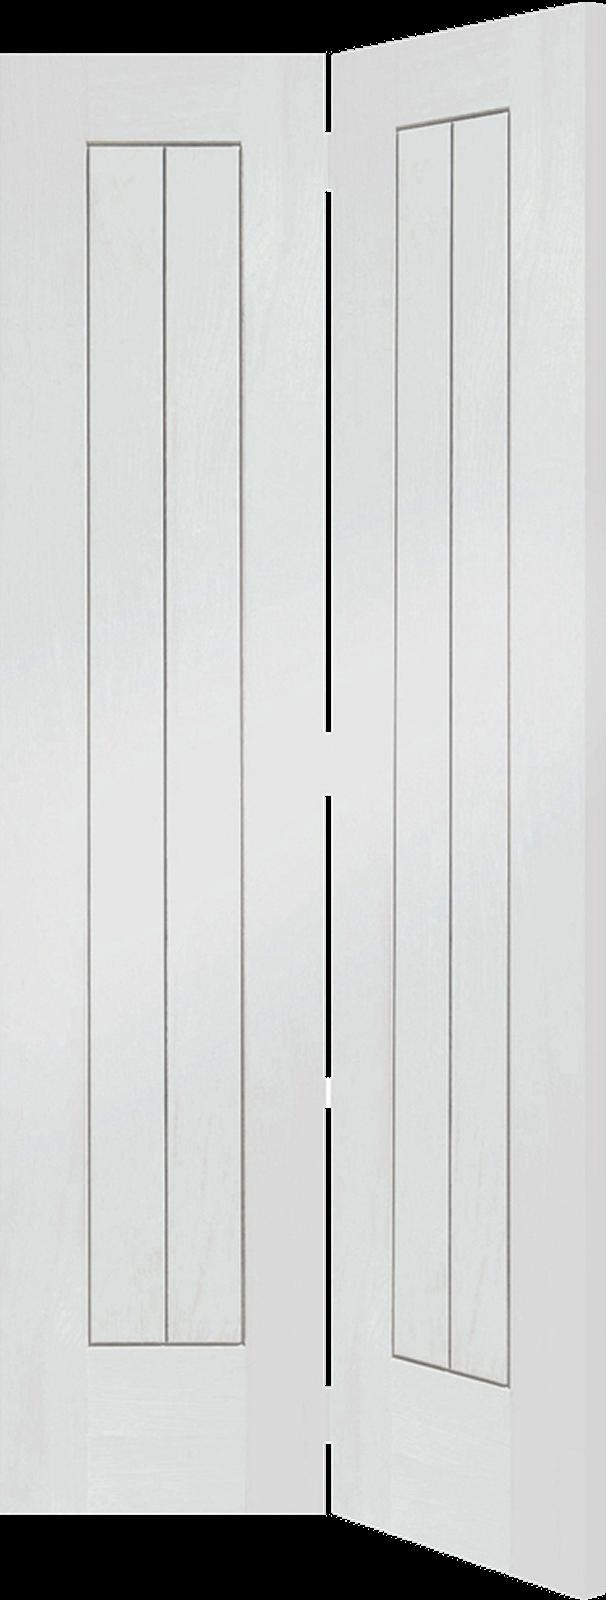 & 27 x 78 White Primed Suffolk Bi-Fold Door